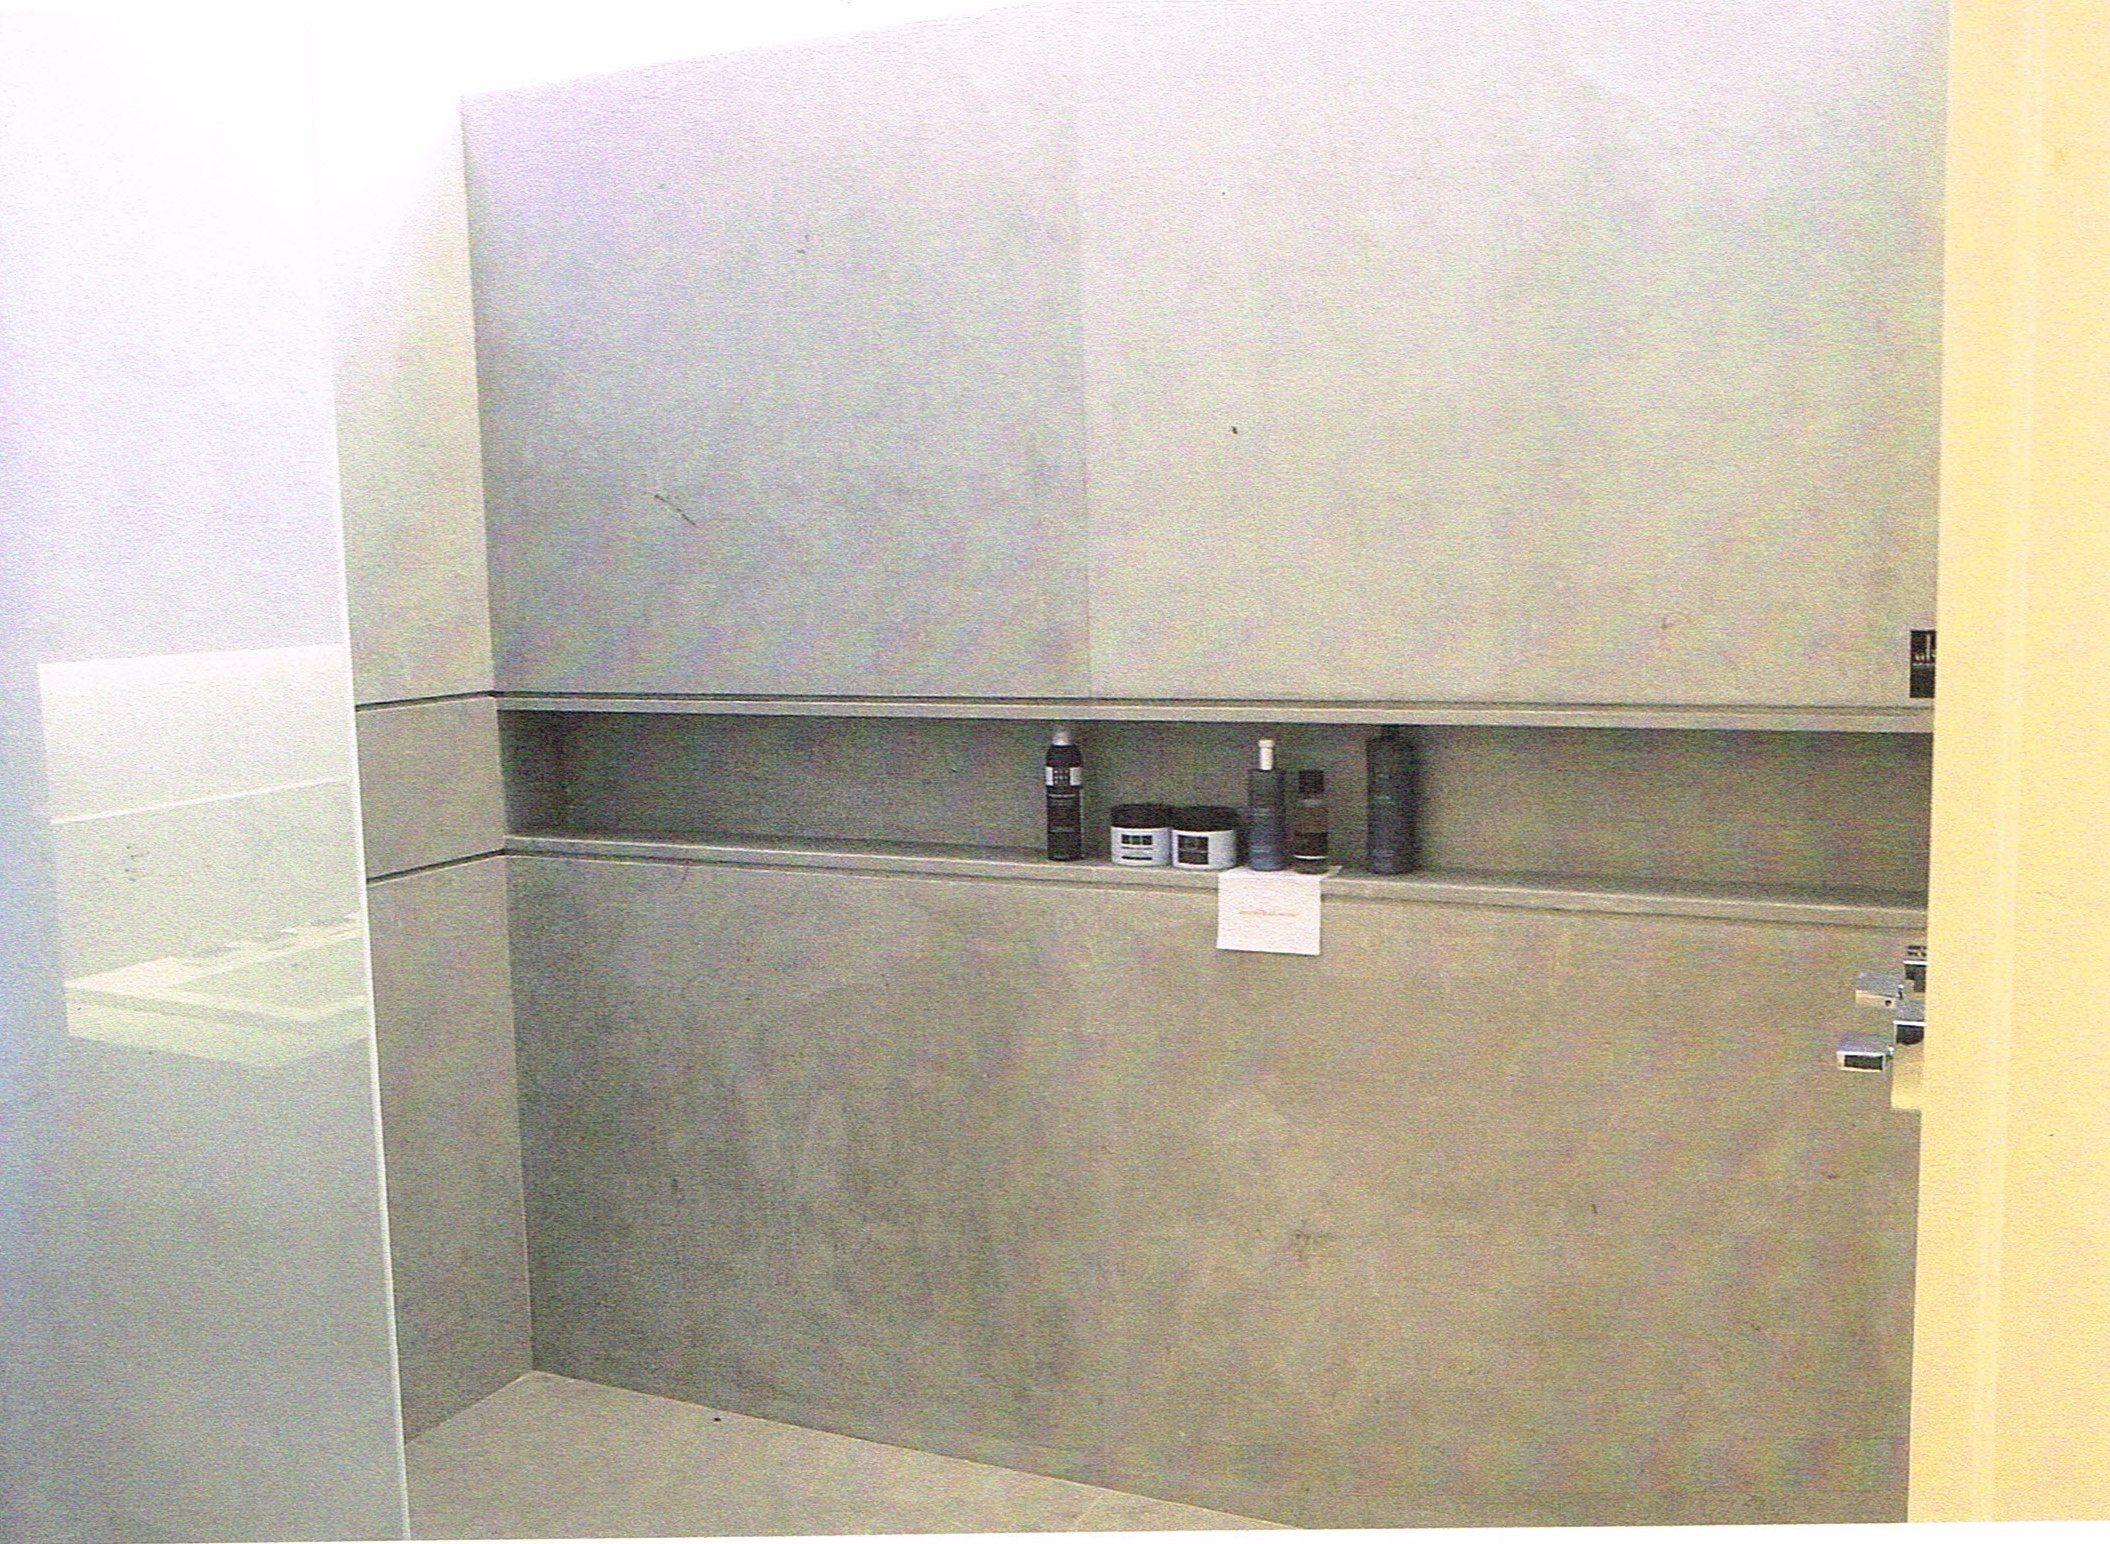 nicho para shampoo  banheiros  Pinterest  Xampus e Caixas -> Nicho Para Shampoo Banheiro